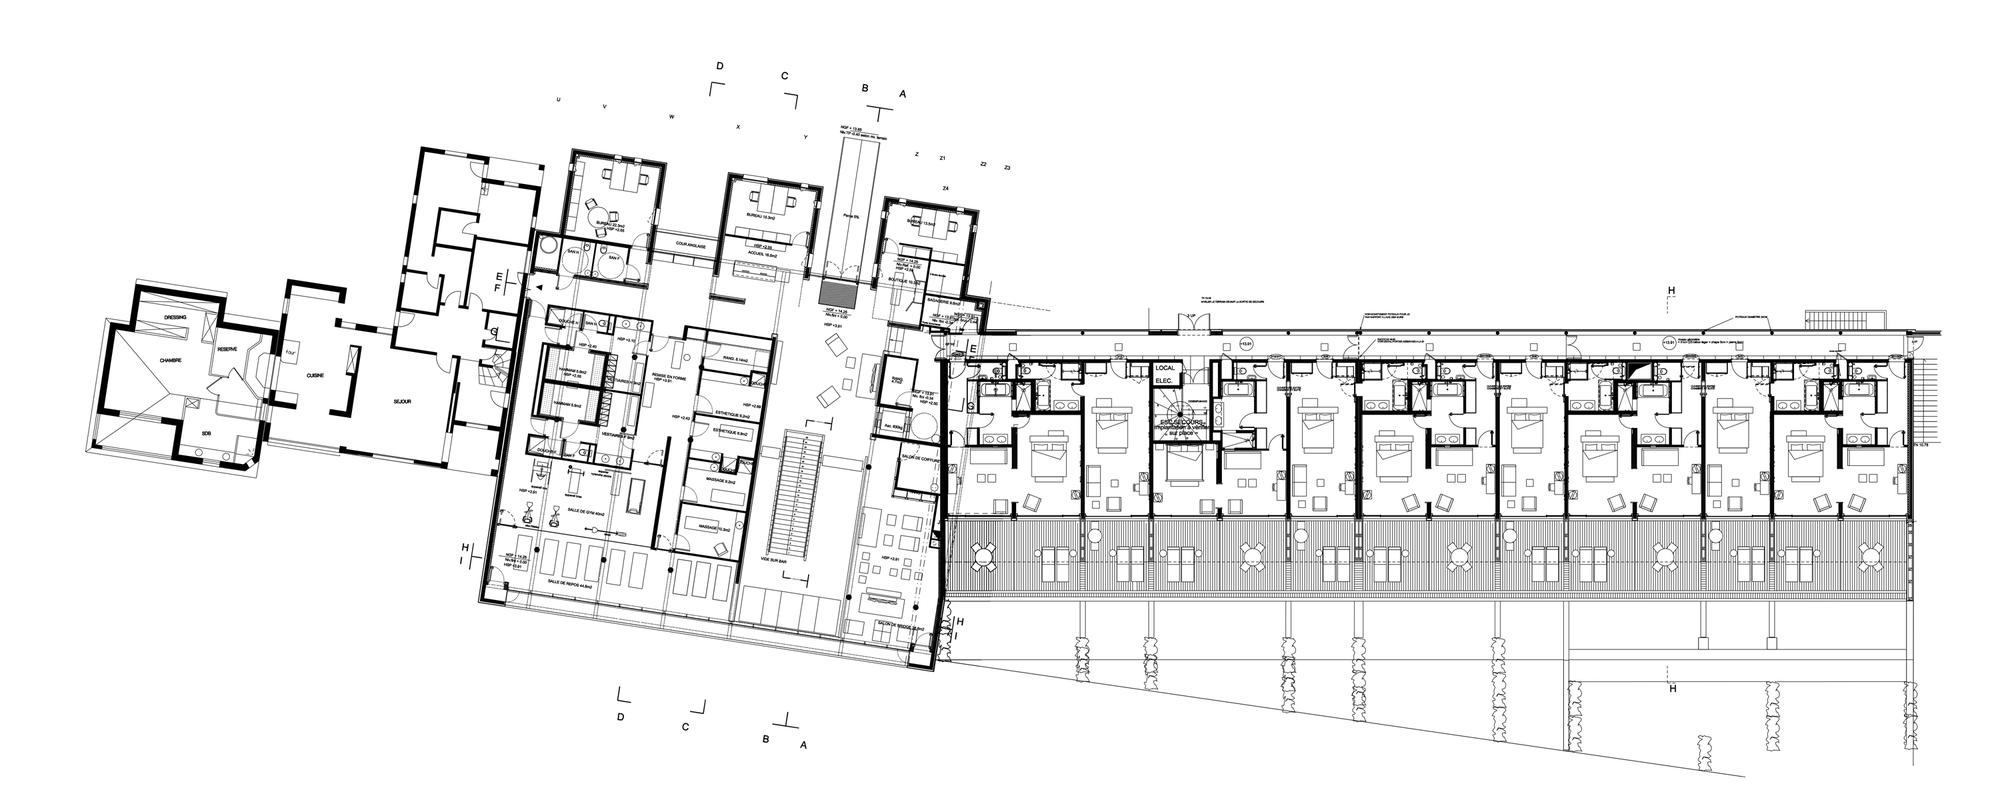 casadelmar-hotel-jean-fran-ois-bodin_plan_100e_-pur-s01